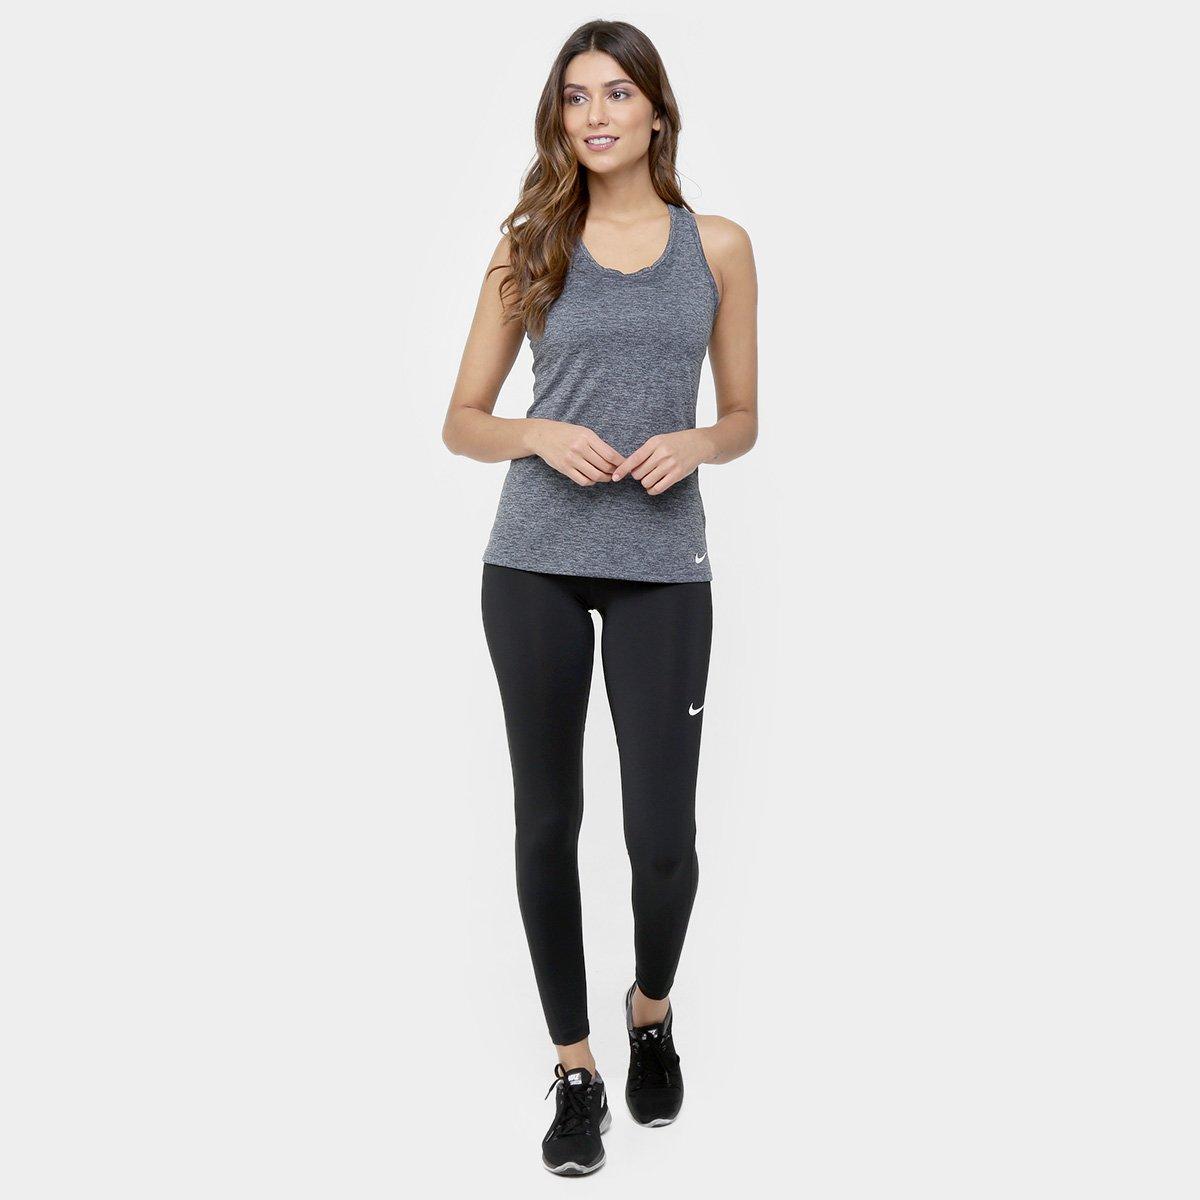 Calça Nike Pro Tight Feminina - Compre Agora  1d5769359ff63